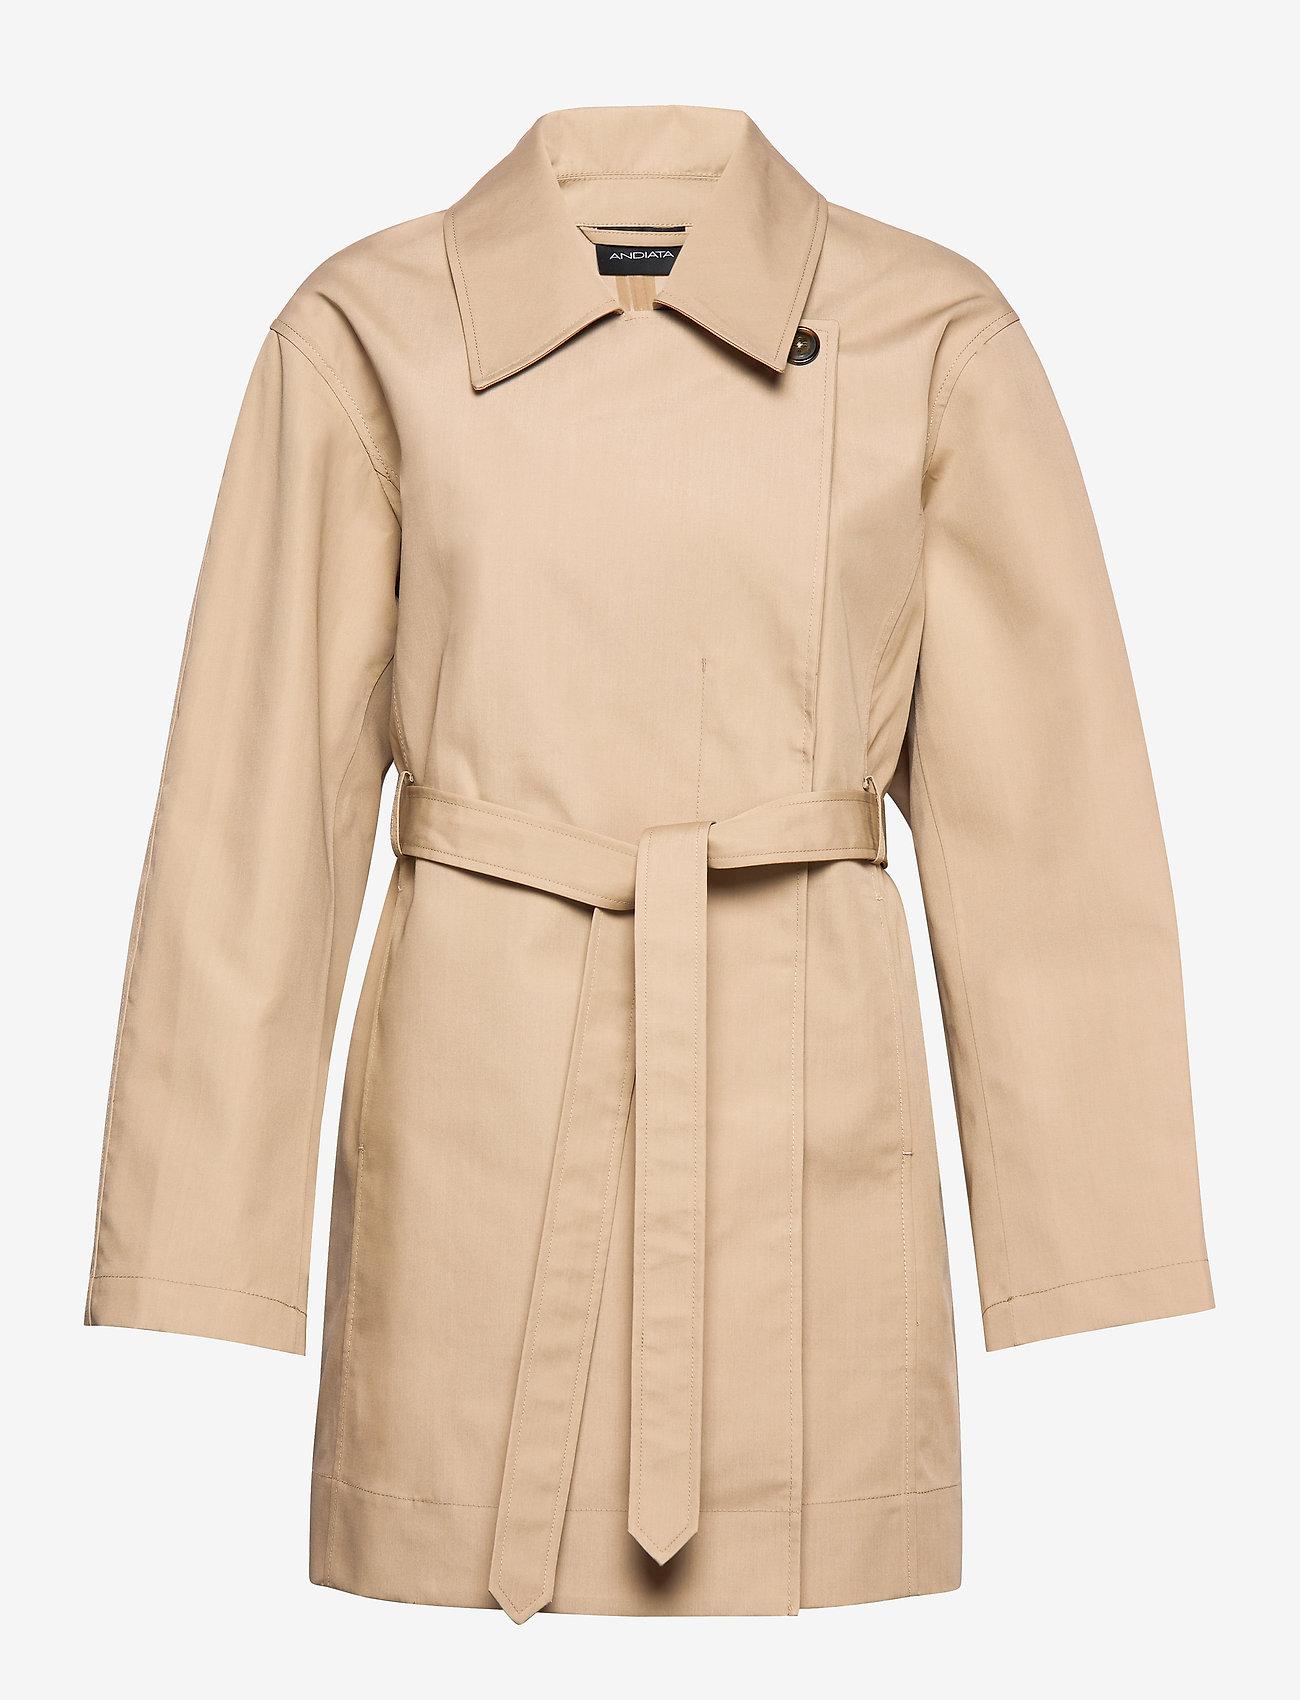 Cotelin Coat (Sand Beige) (221.40 €) - Andiata ZjtvP